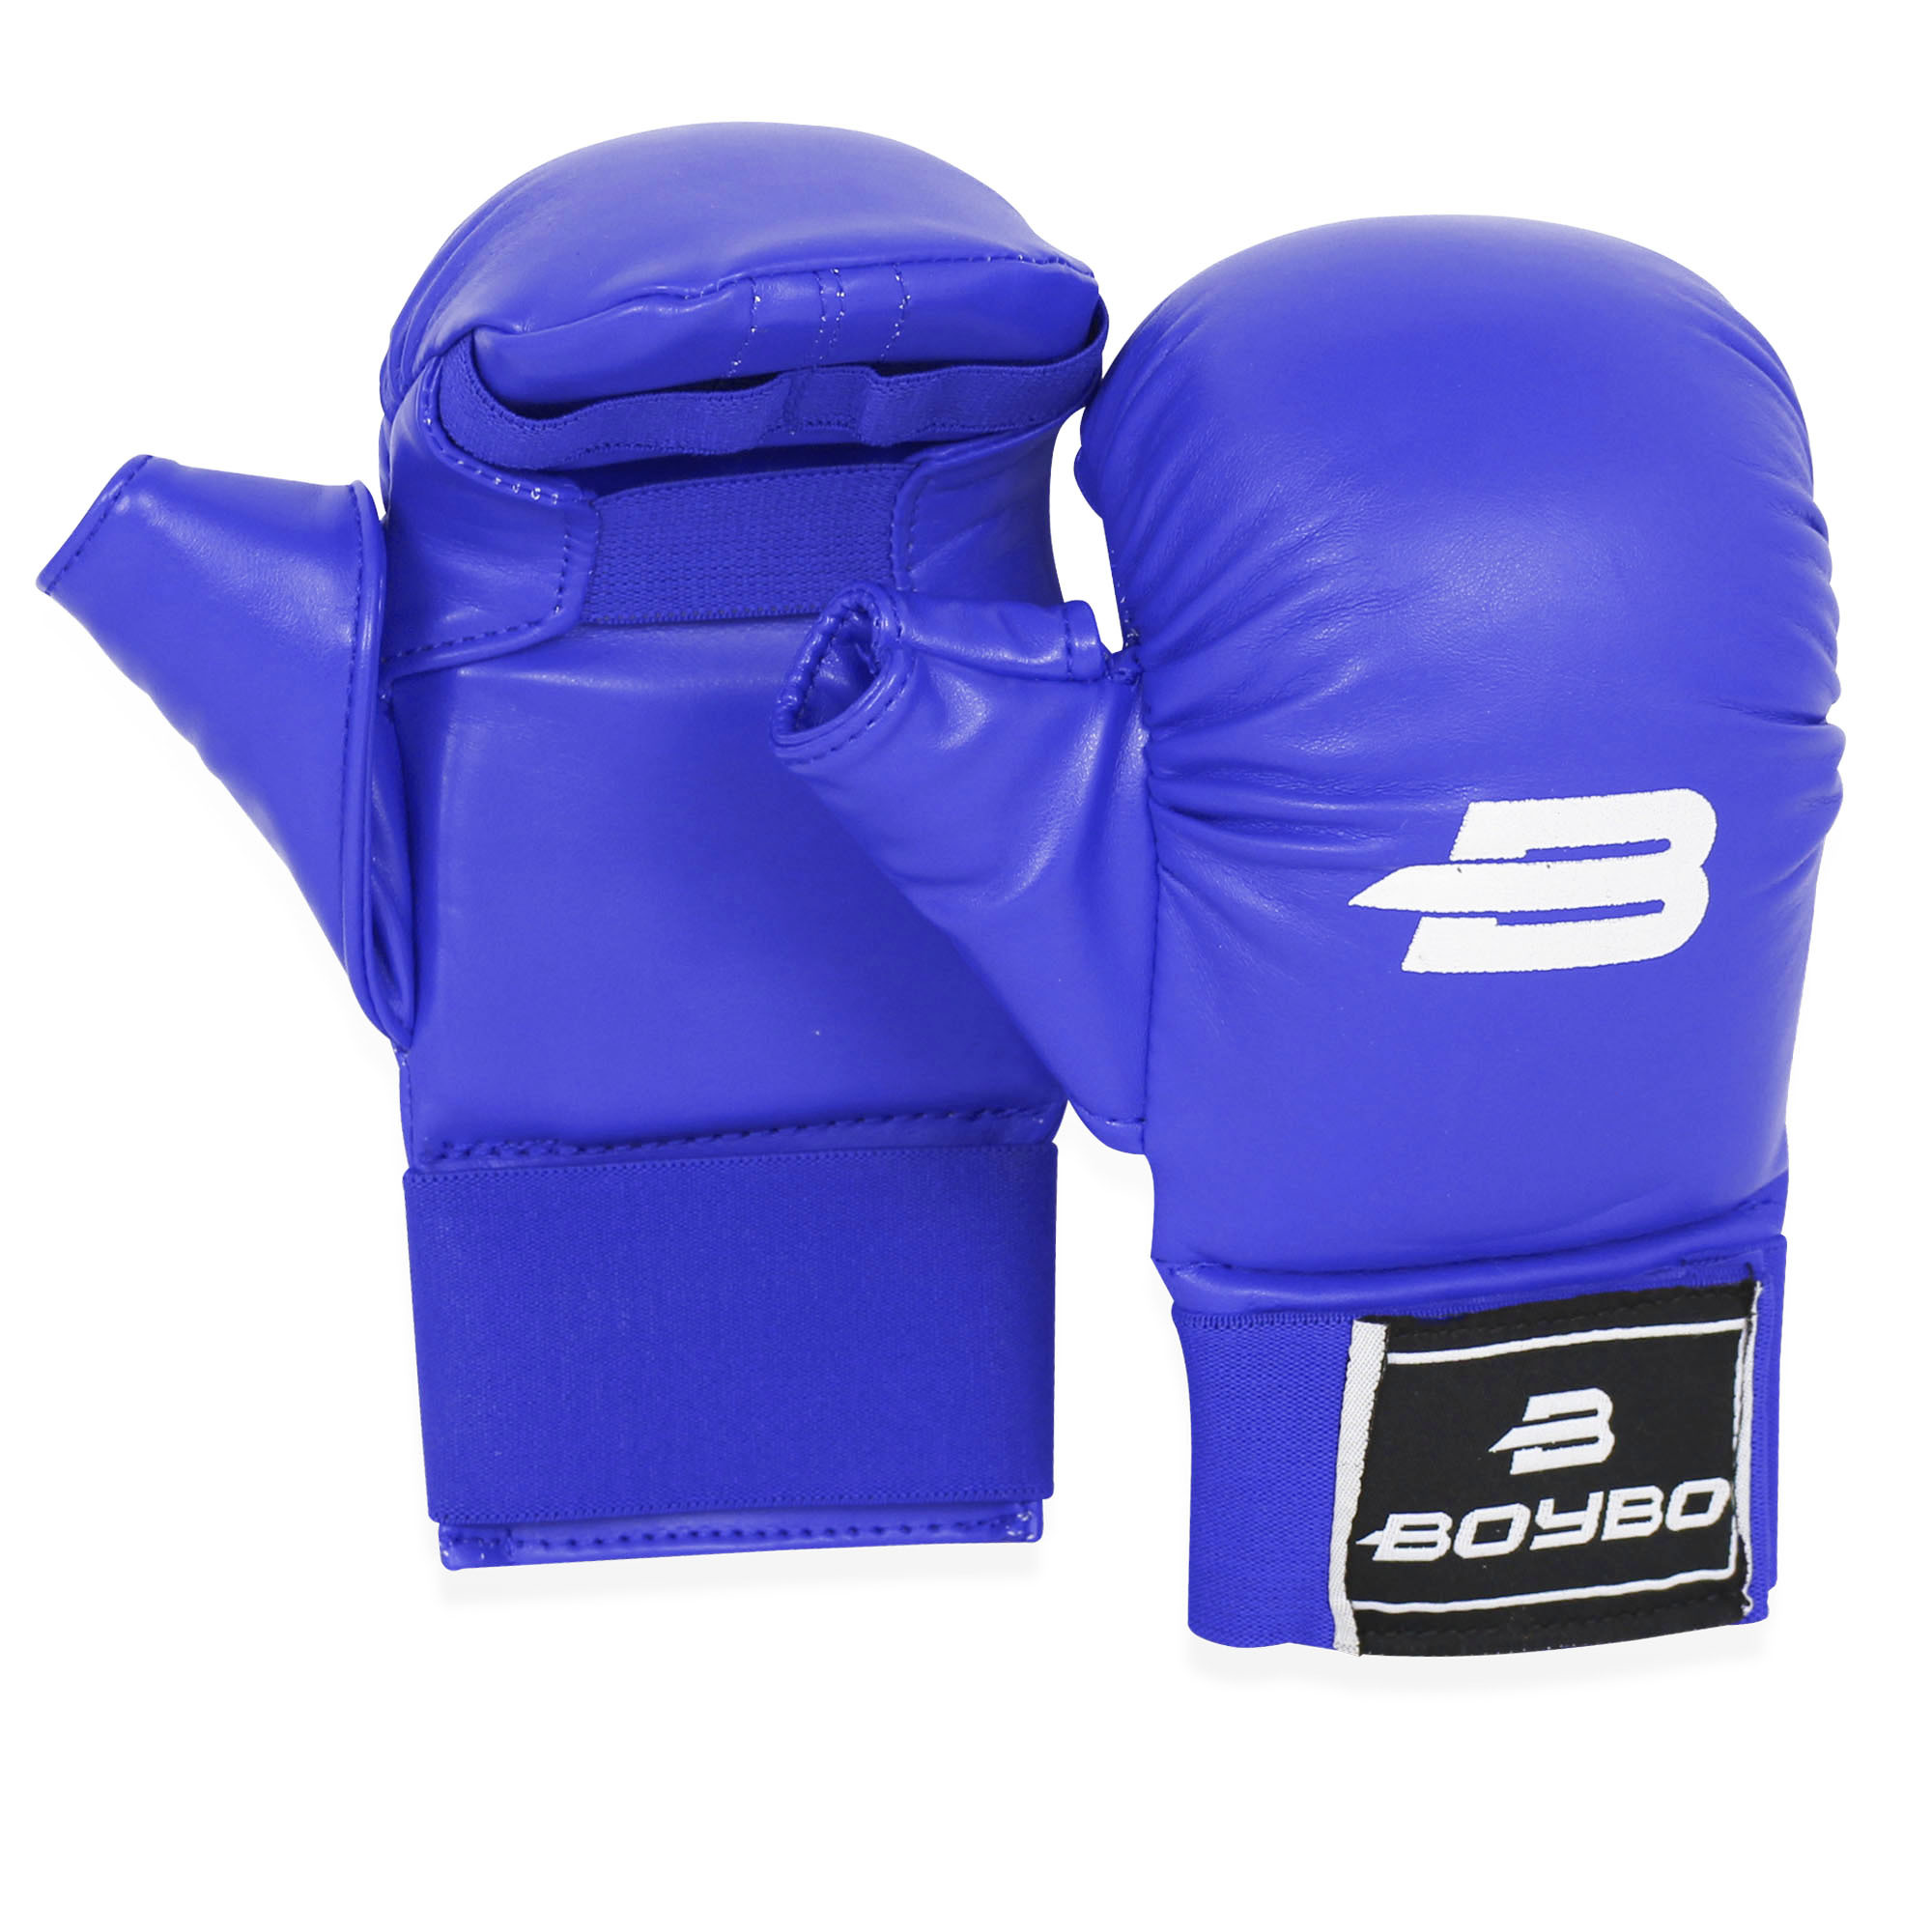 Перчатки/накладки Накладки для каратэ с защитой пальца nakladki-dlya-karate-boybo-s-zashhitoy-paltsa-sinie__1_.jpg